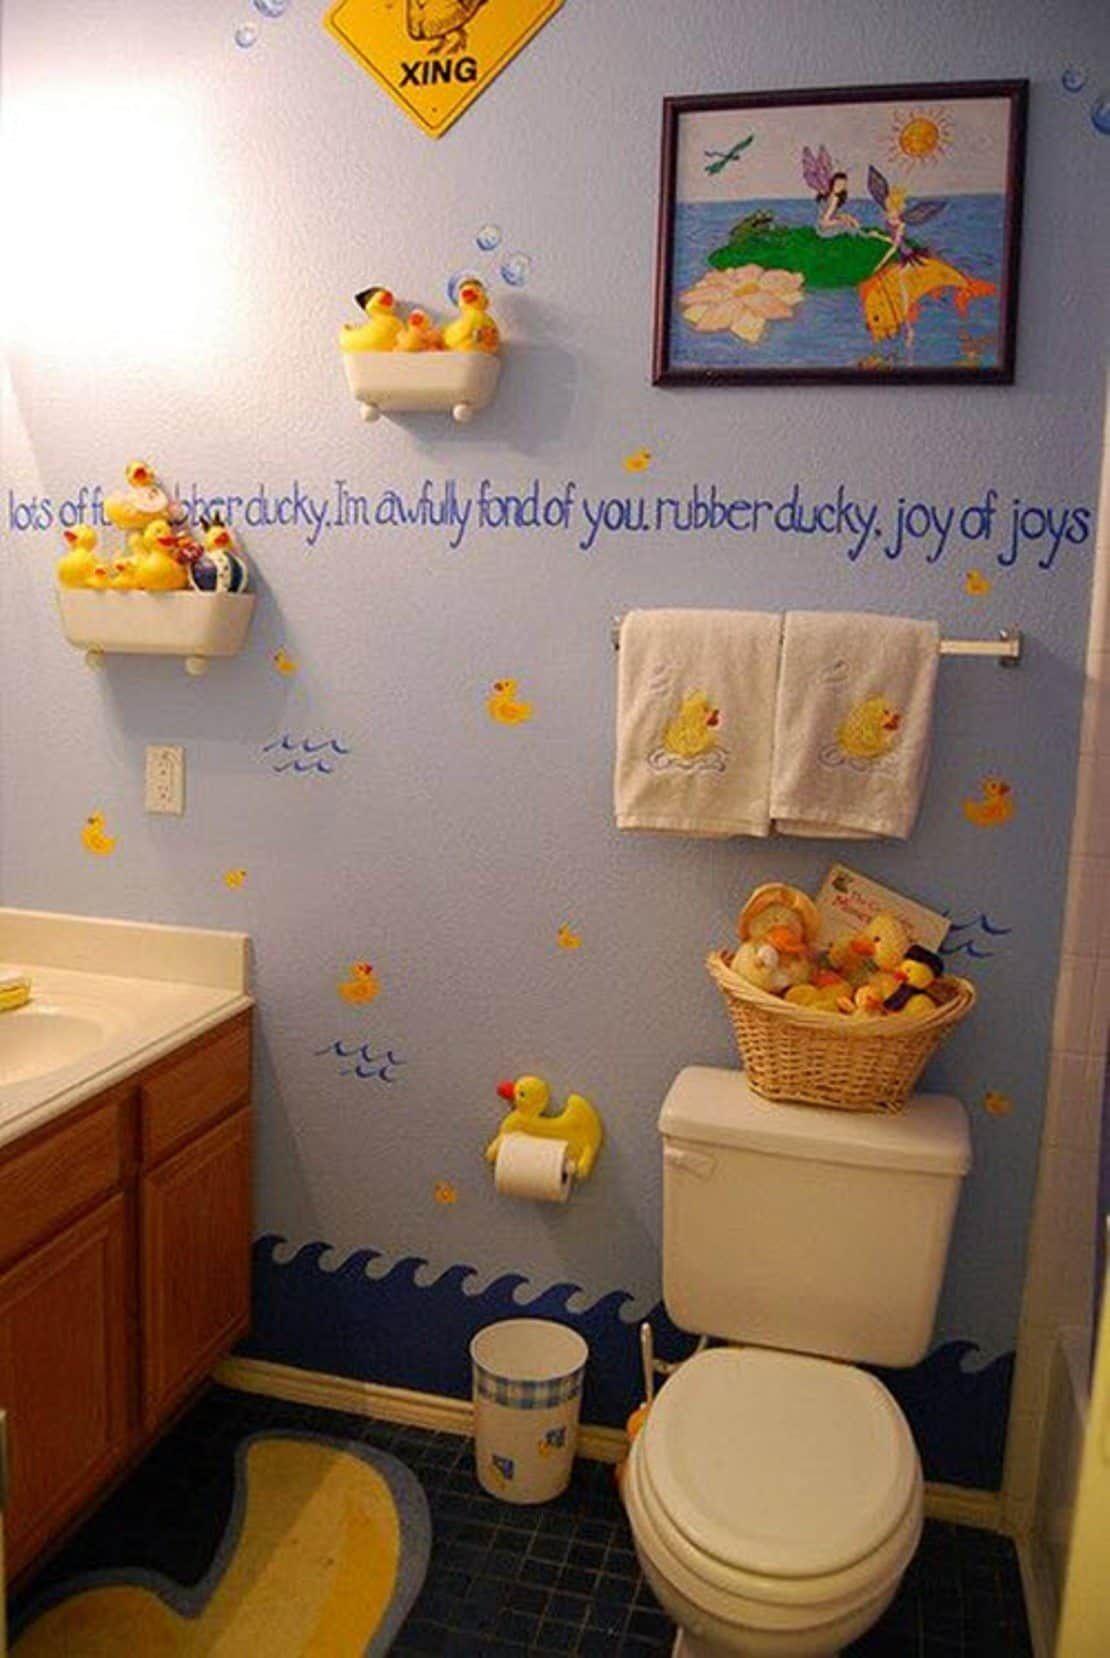 fun and cute rubber duck bathroom decor | kids bathroom